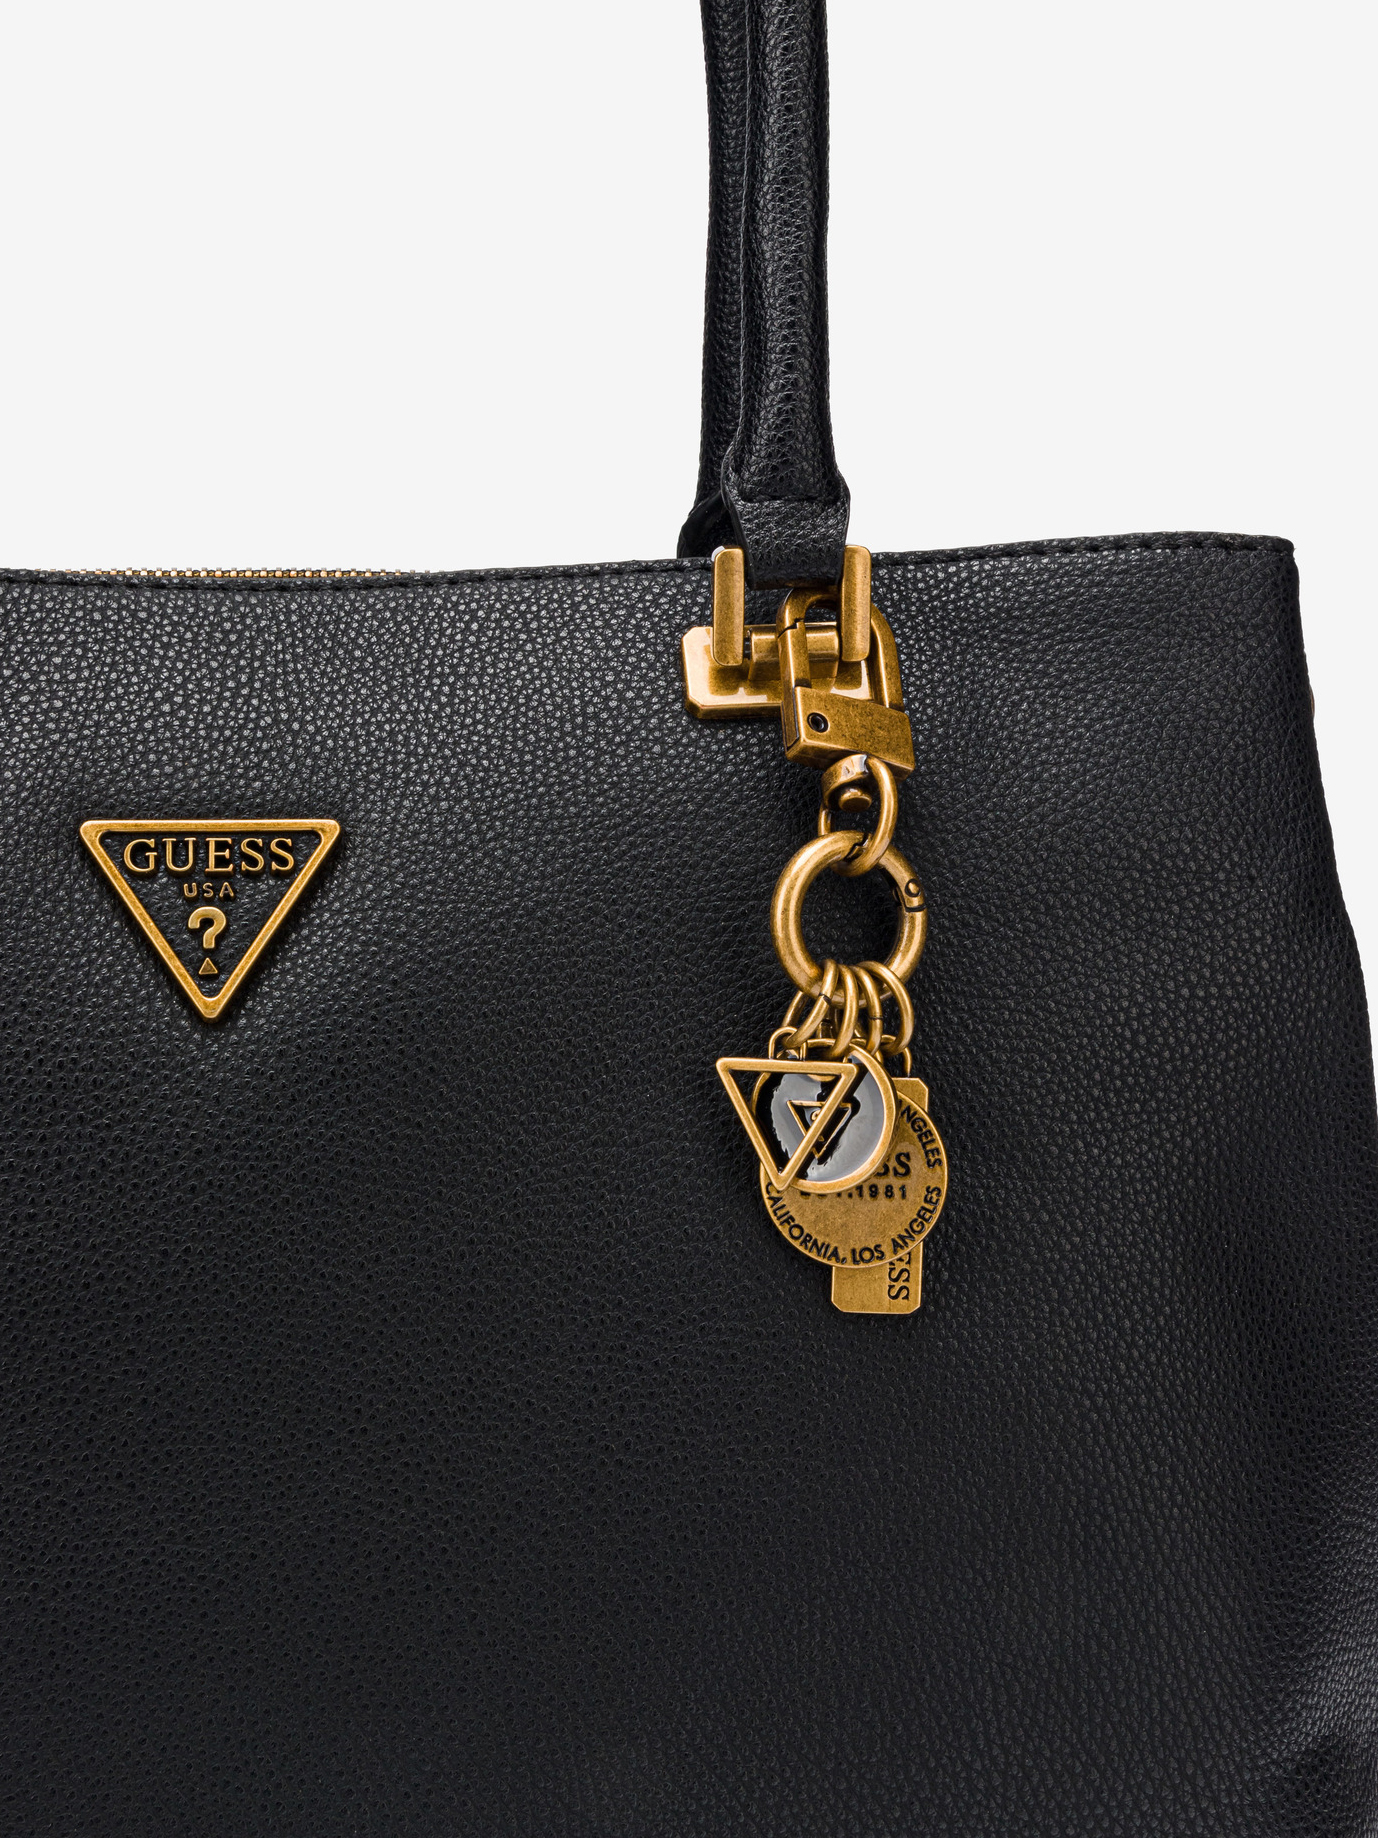 Guess black handbag Destiny Society